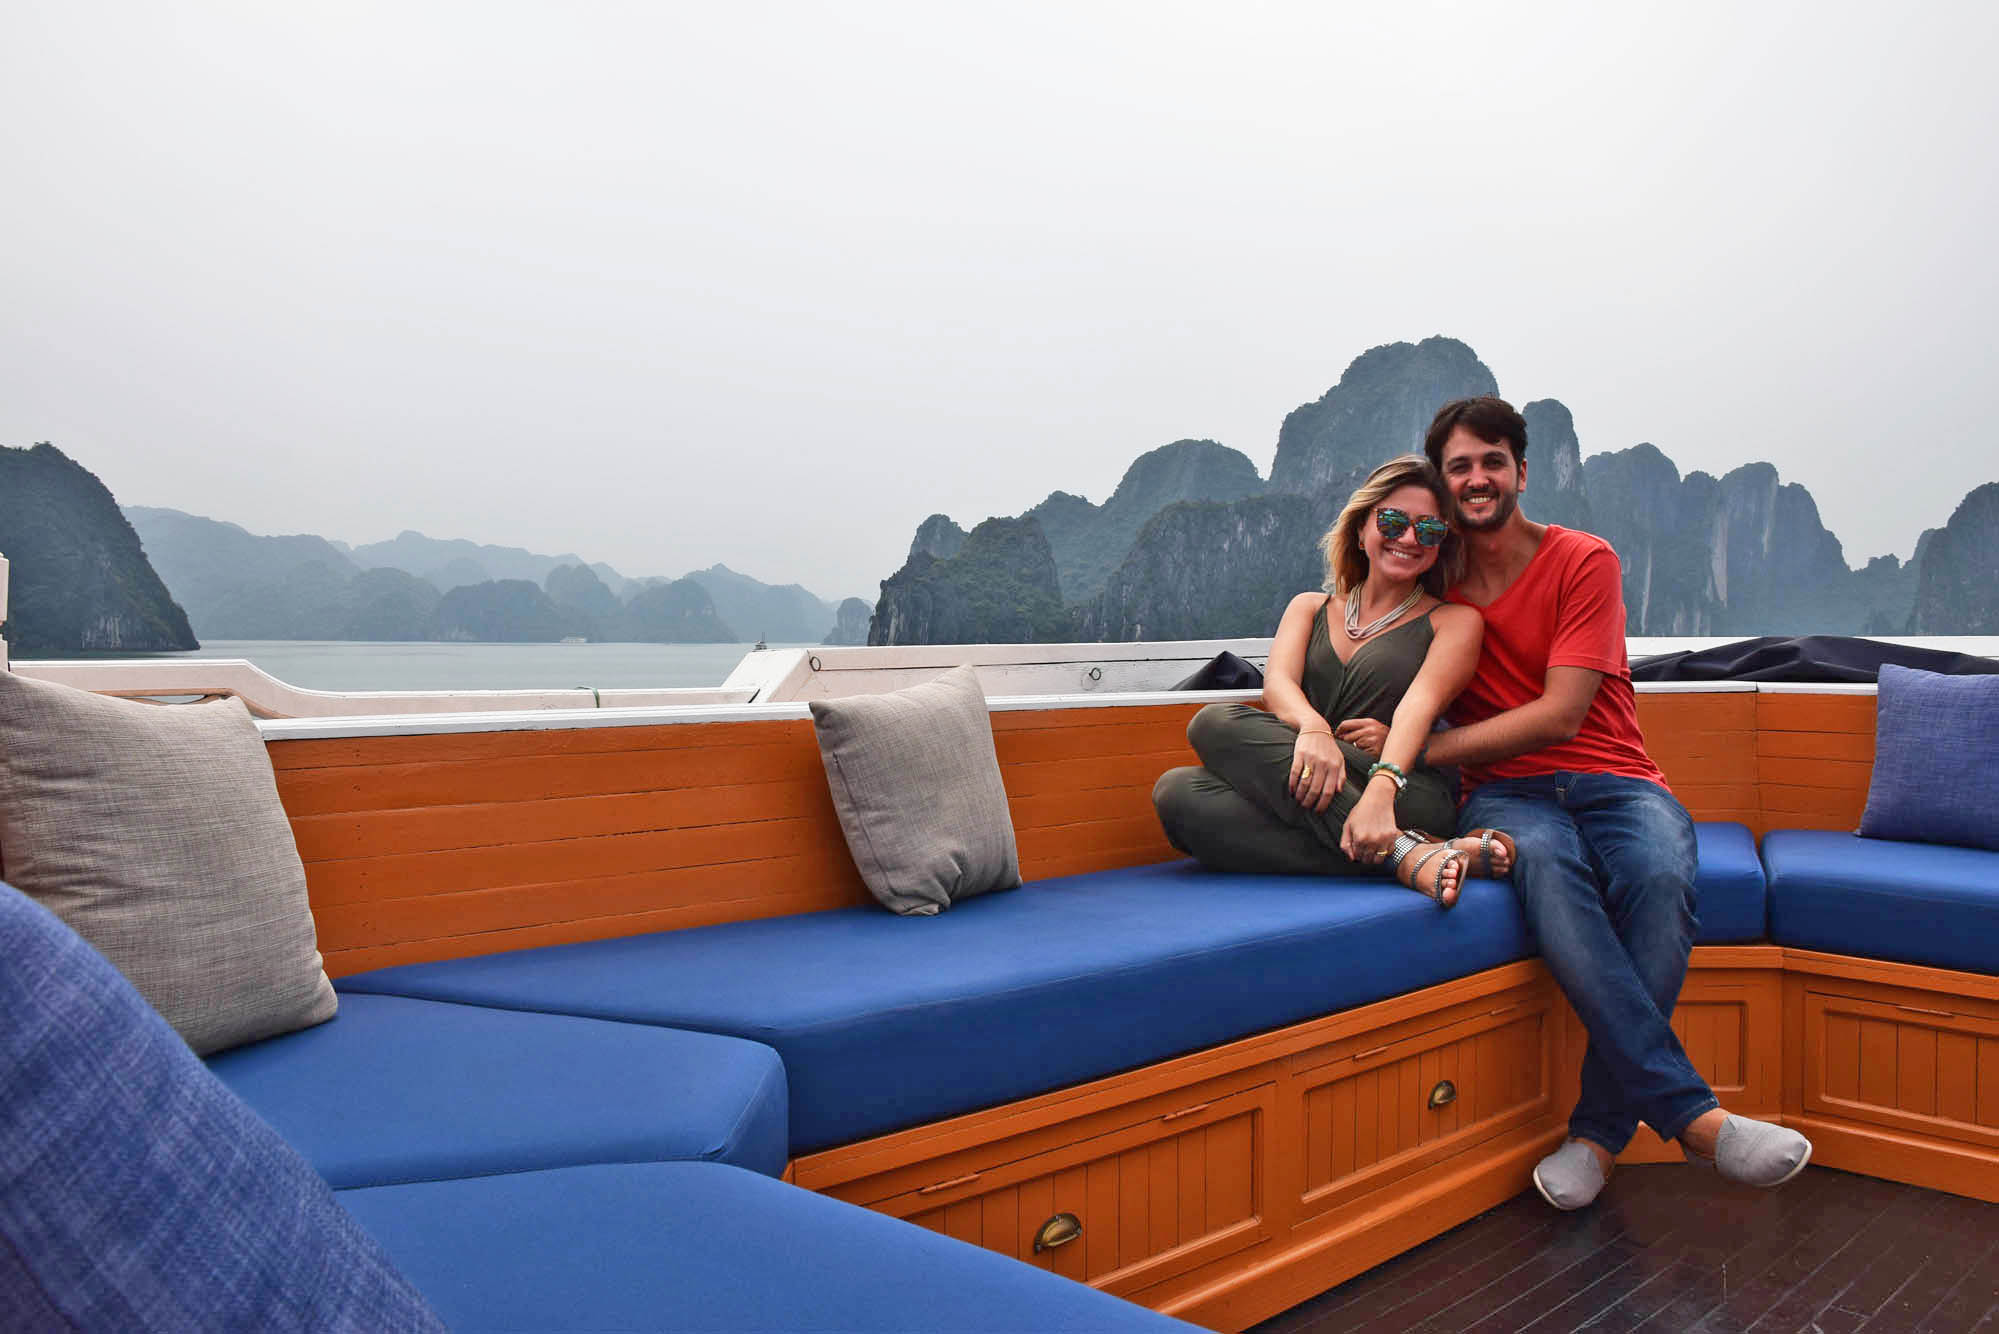 halong-bay-paradise-luxury-cruise-dica-de-barco-passeio